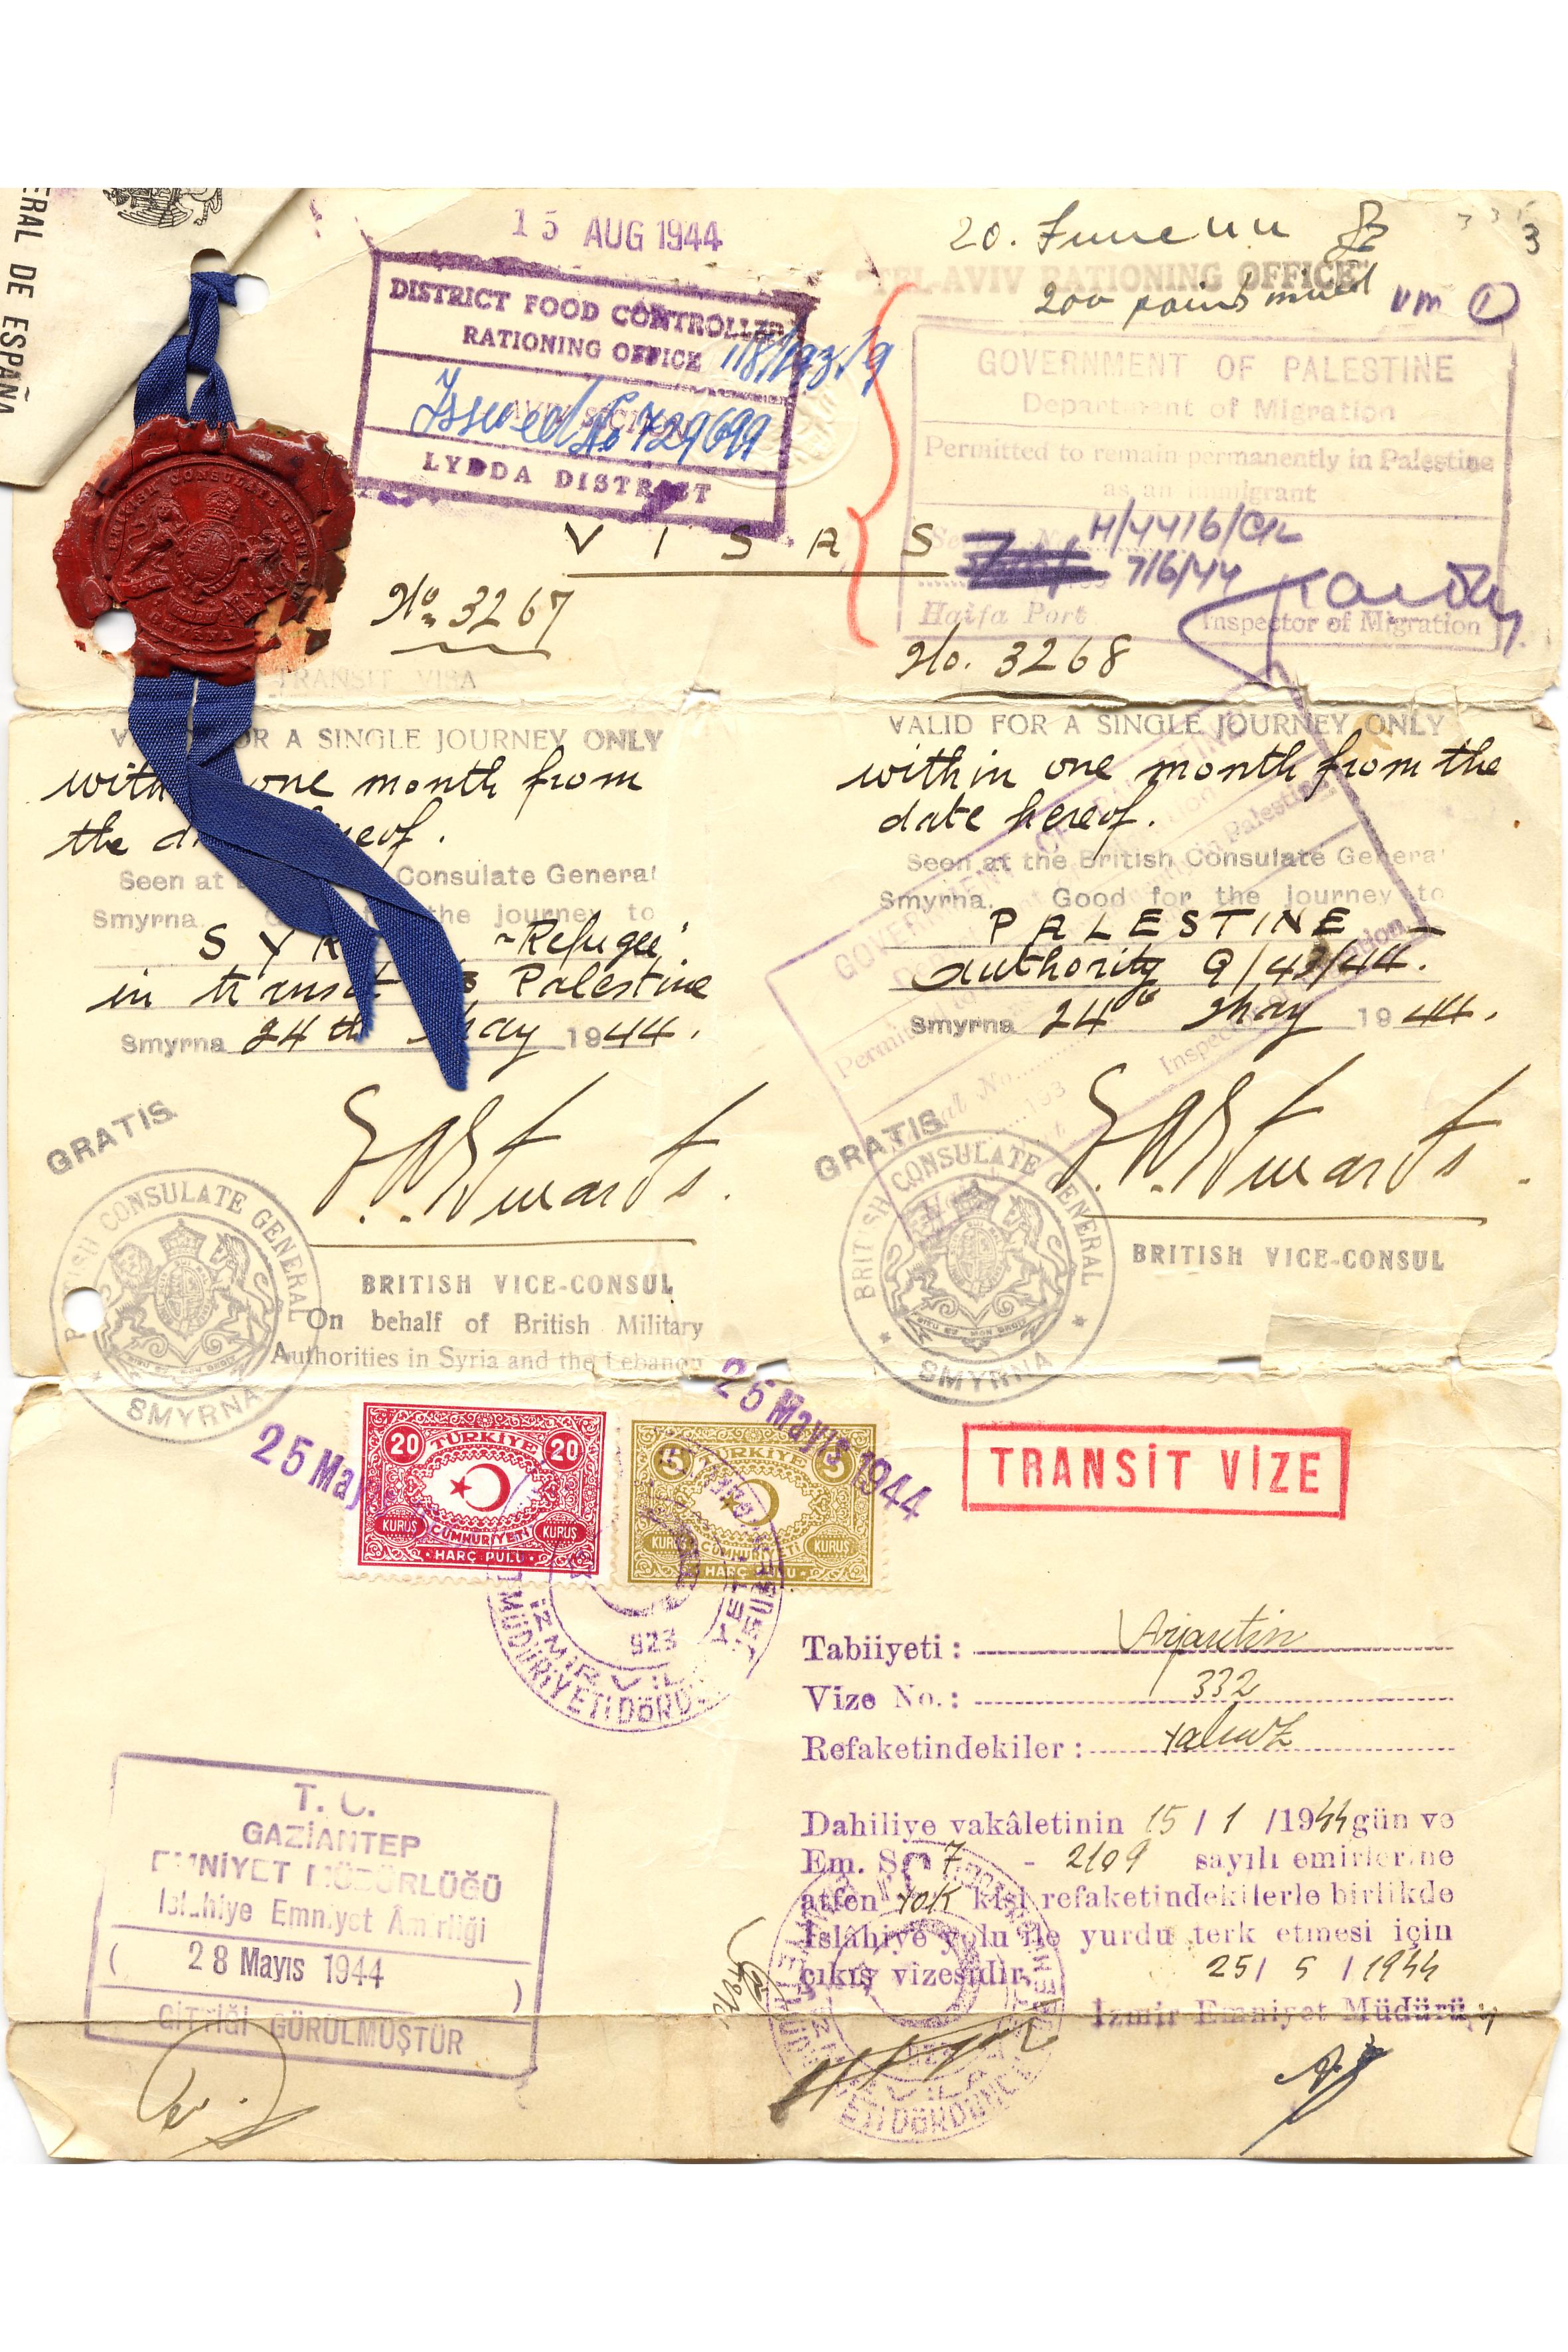 Renee Molho's traveling permit